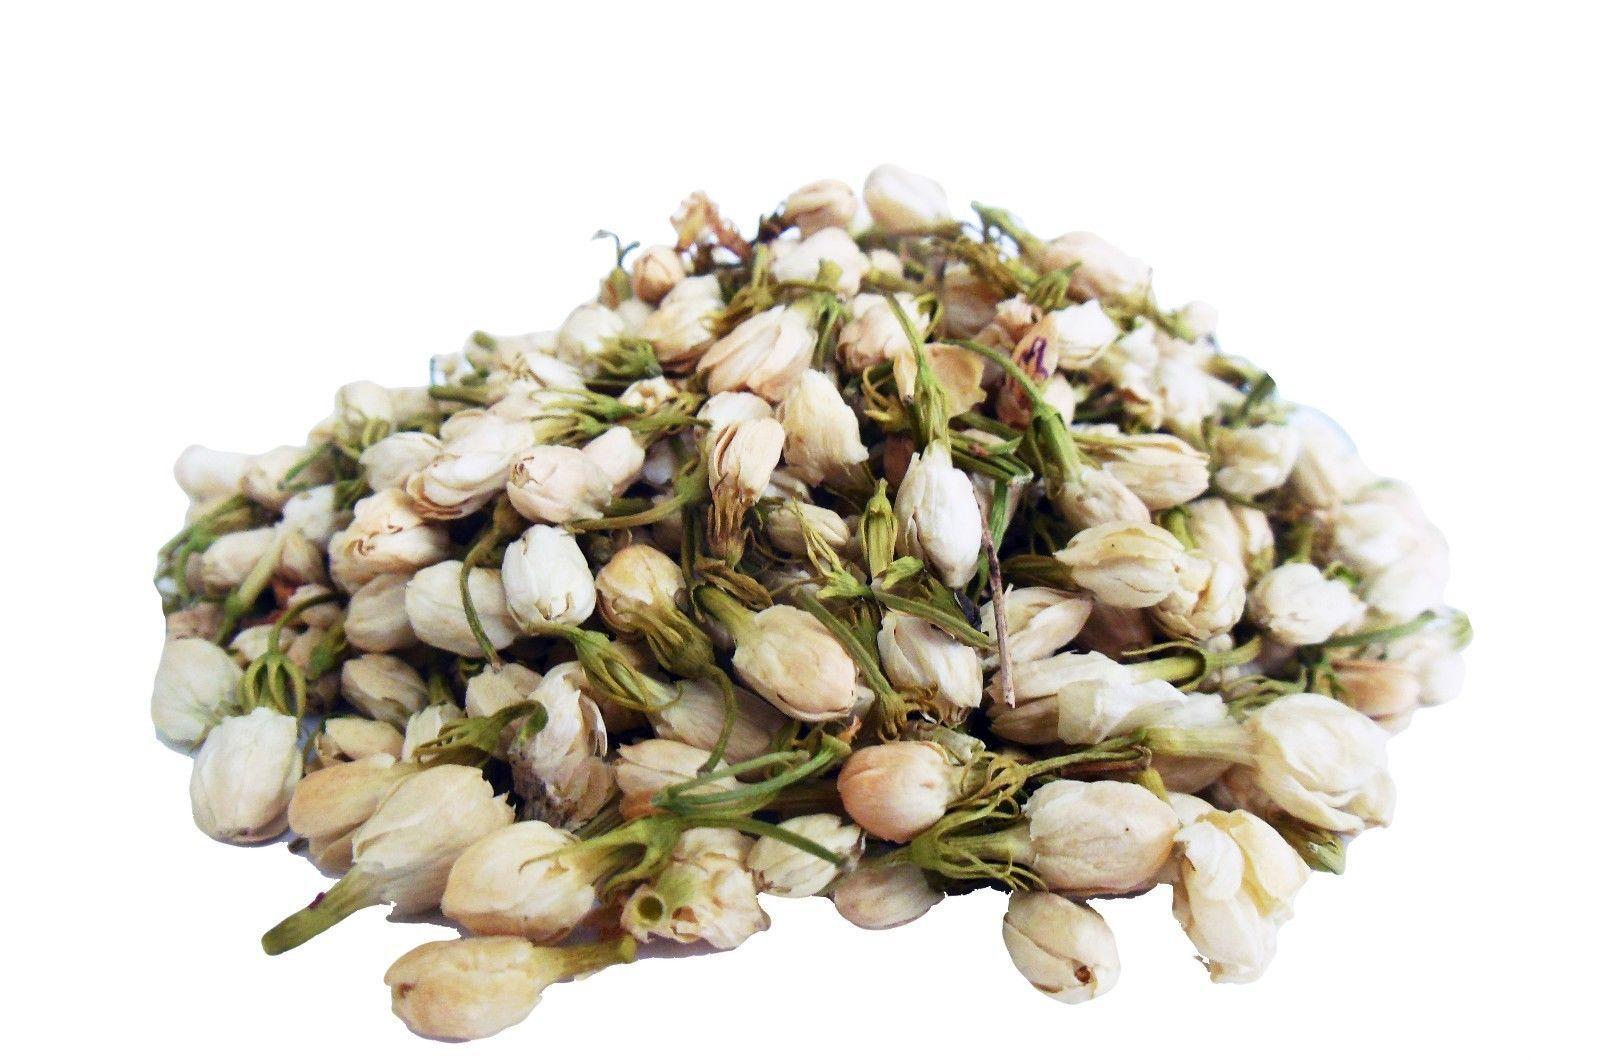 Dried jasmine flowers tea culinary herb herbal kosher wedding dried jasmine flowers tea culinary herb herbal kosher wedding perfume 1 16 oz izmirmasajfo